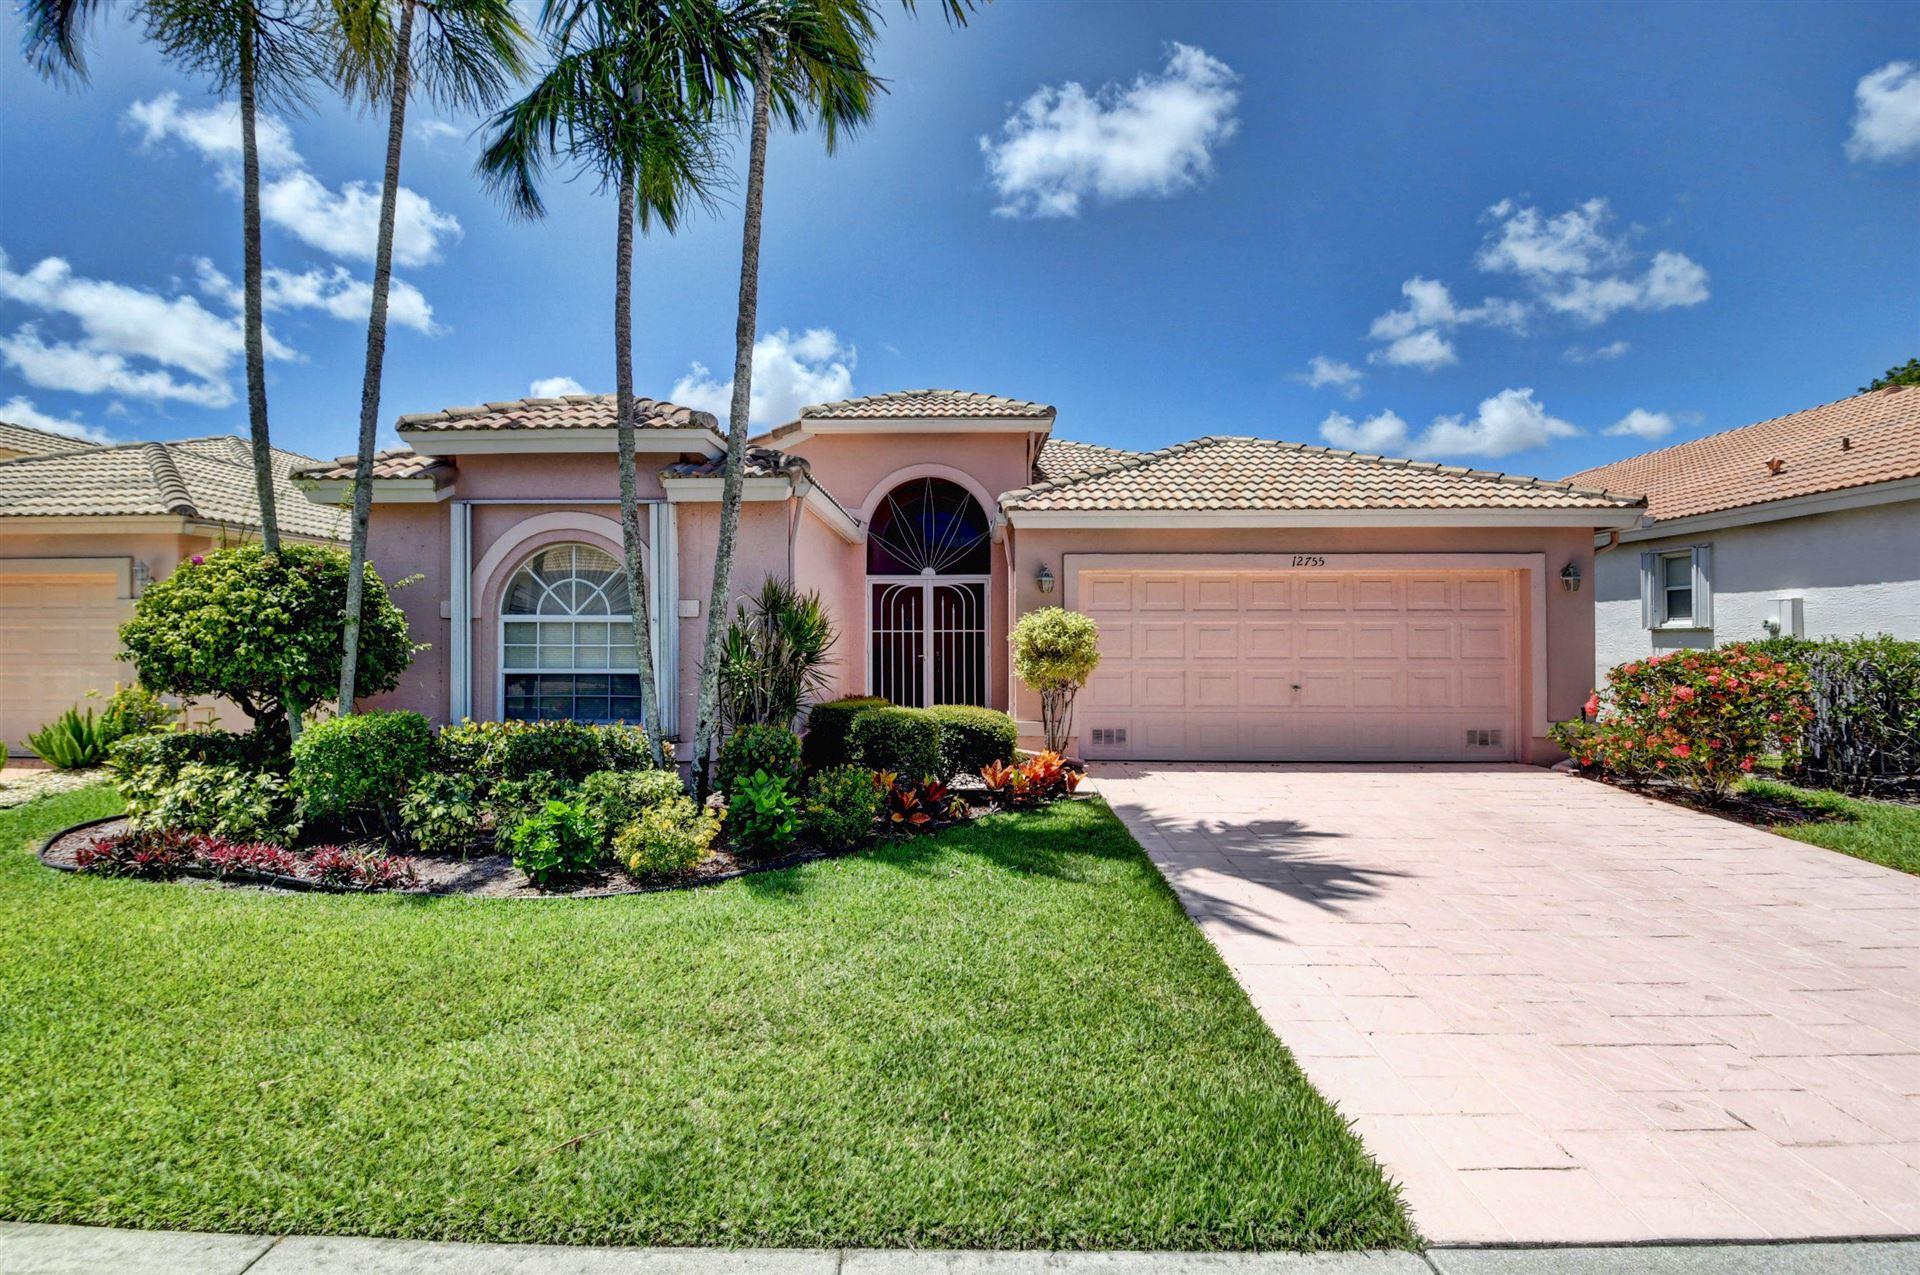 12755 Coral Lakes Drive, Boynton Beach, FL 33437 - MLS#: RX-10722851